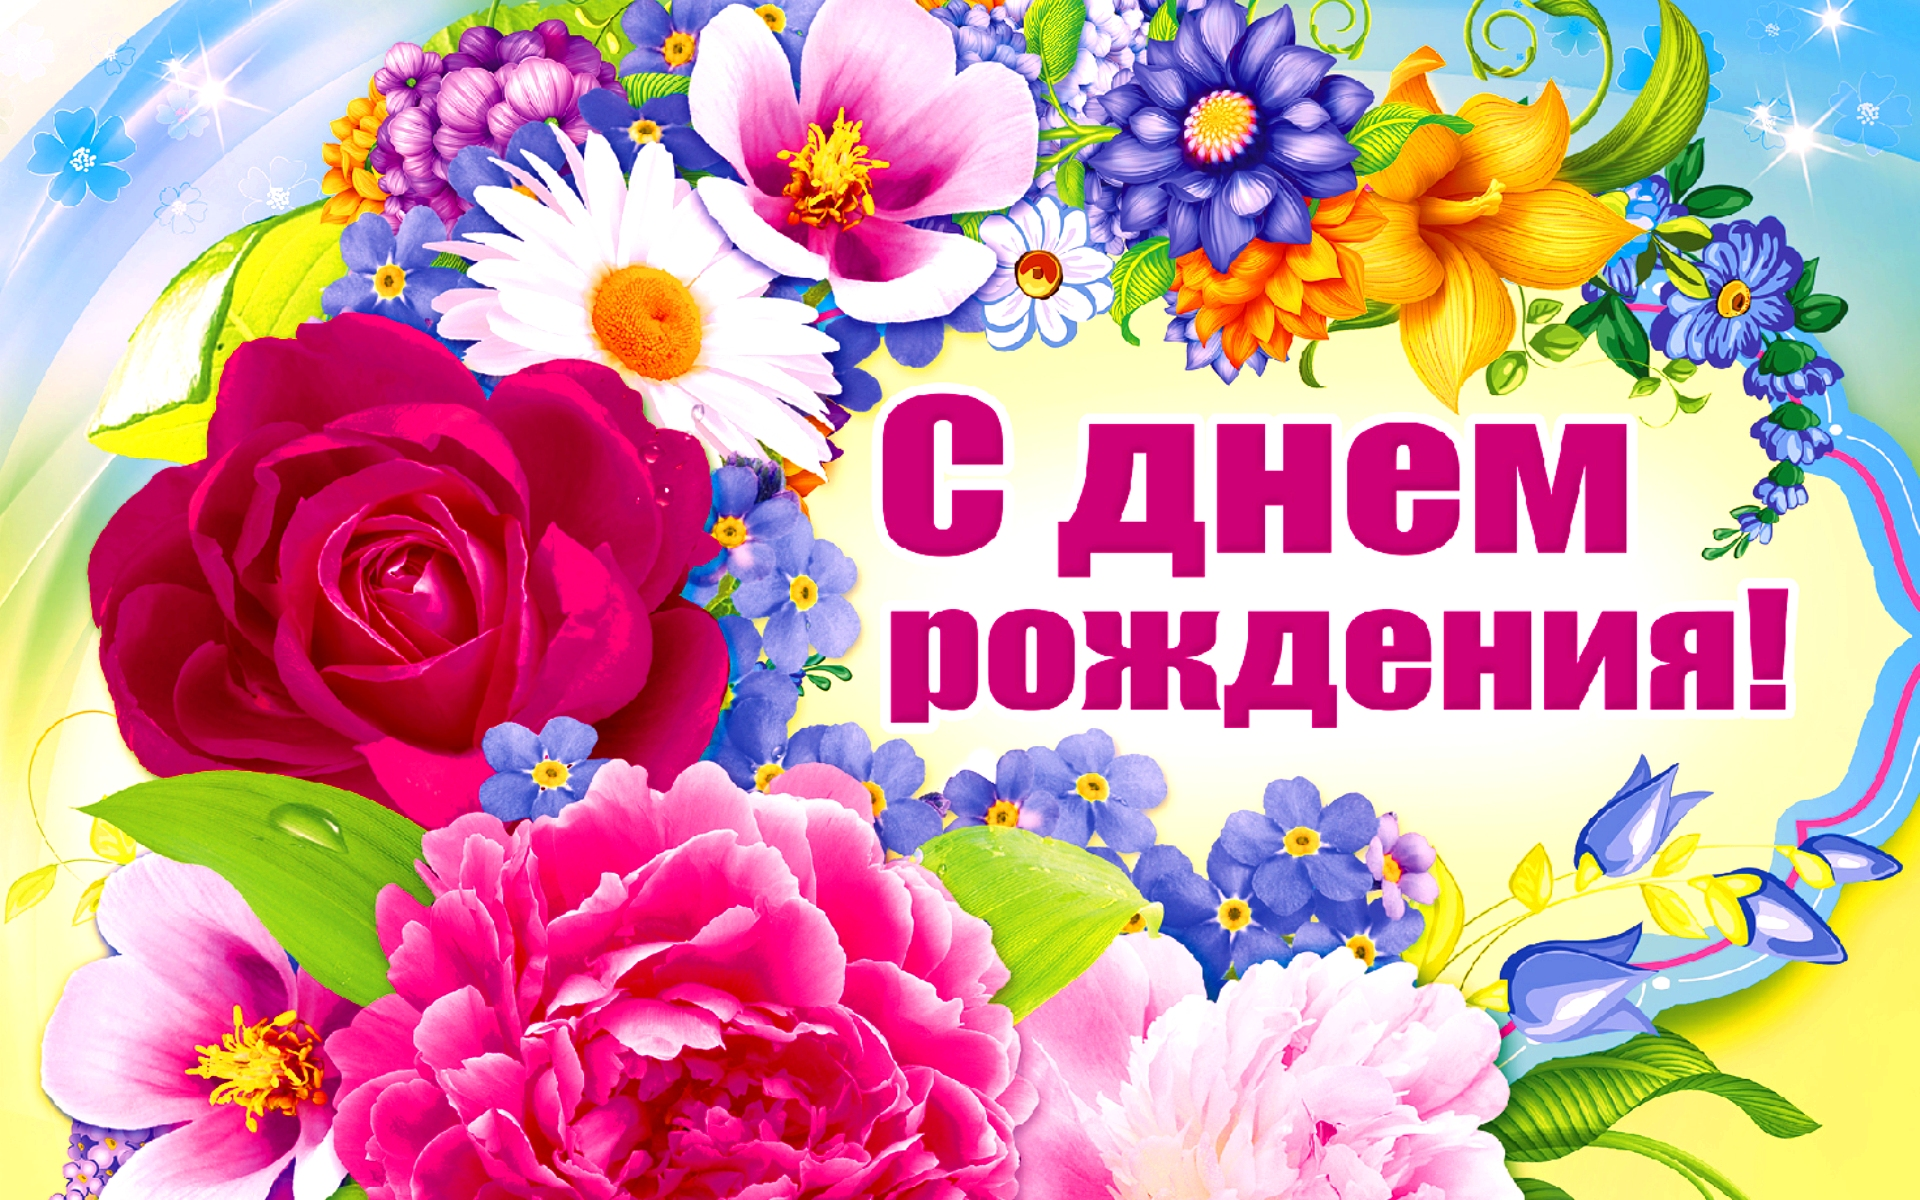 http://alik-profcom.ucoz.ru/foto/2018/kartinki24_ru_birthday_63.jpg